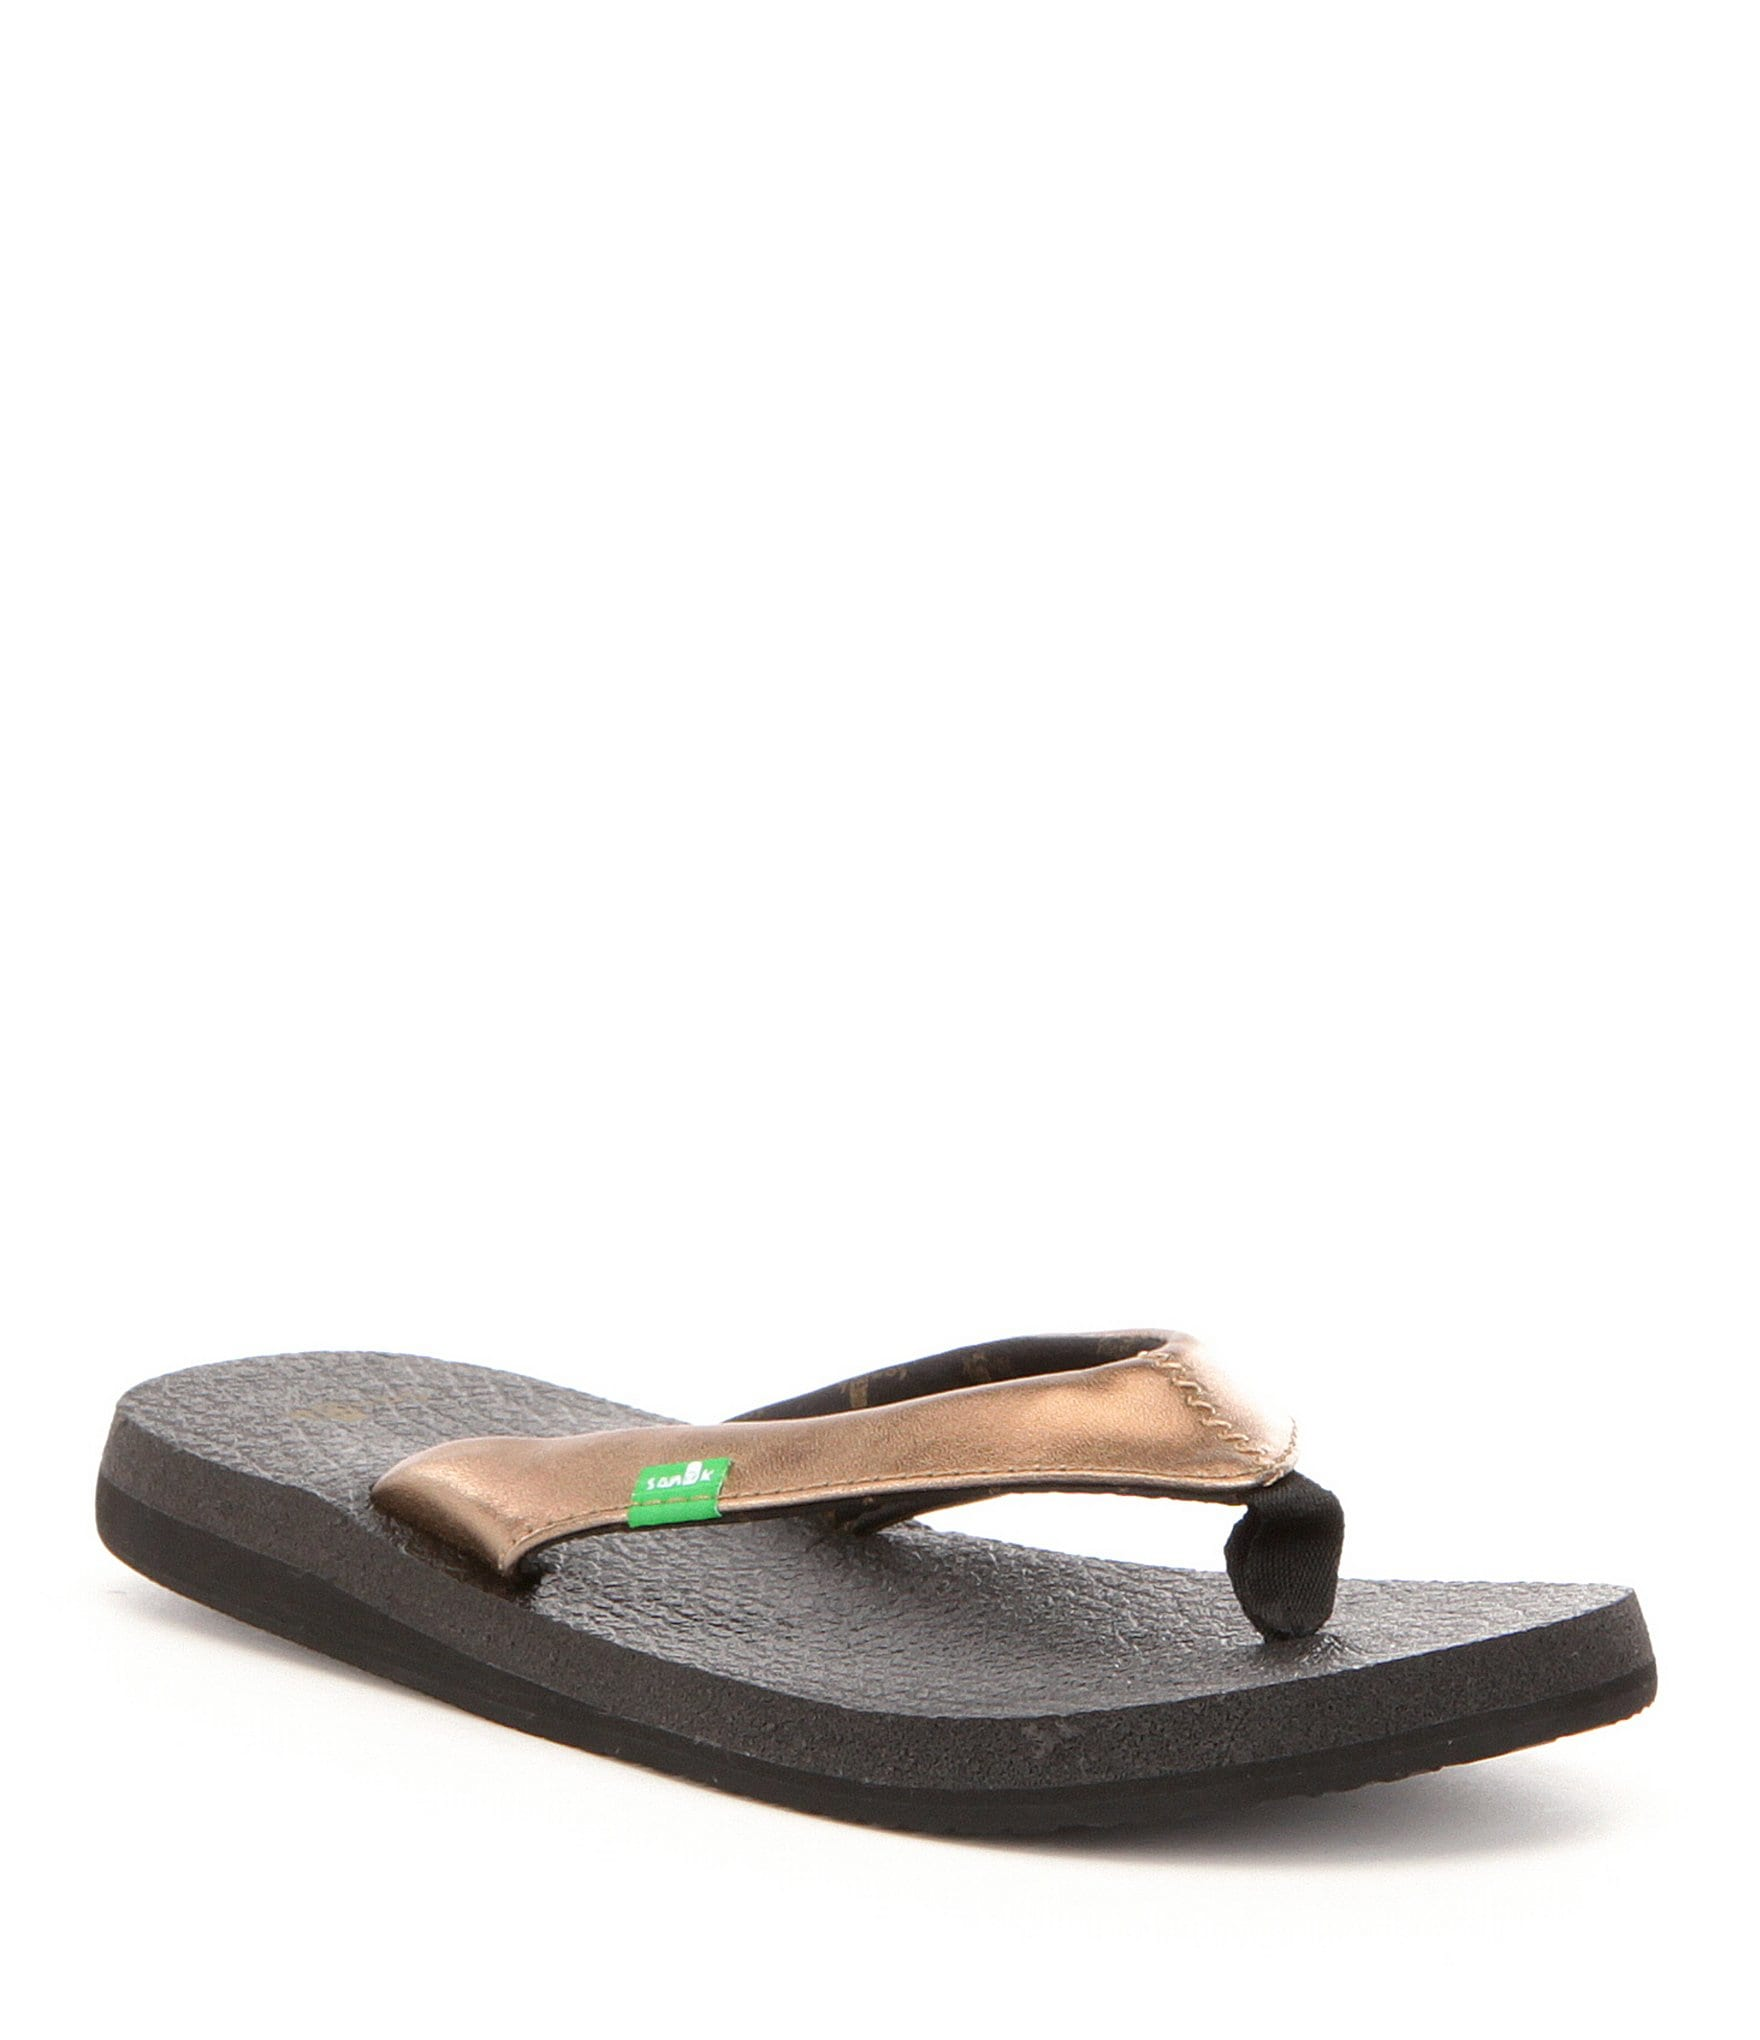 Black rainbow sandals with crystals - Black Rainbow Sandals With Crystals 59